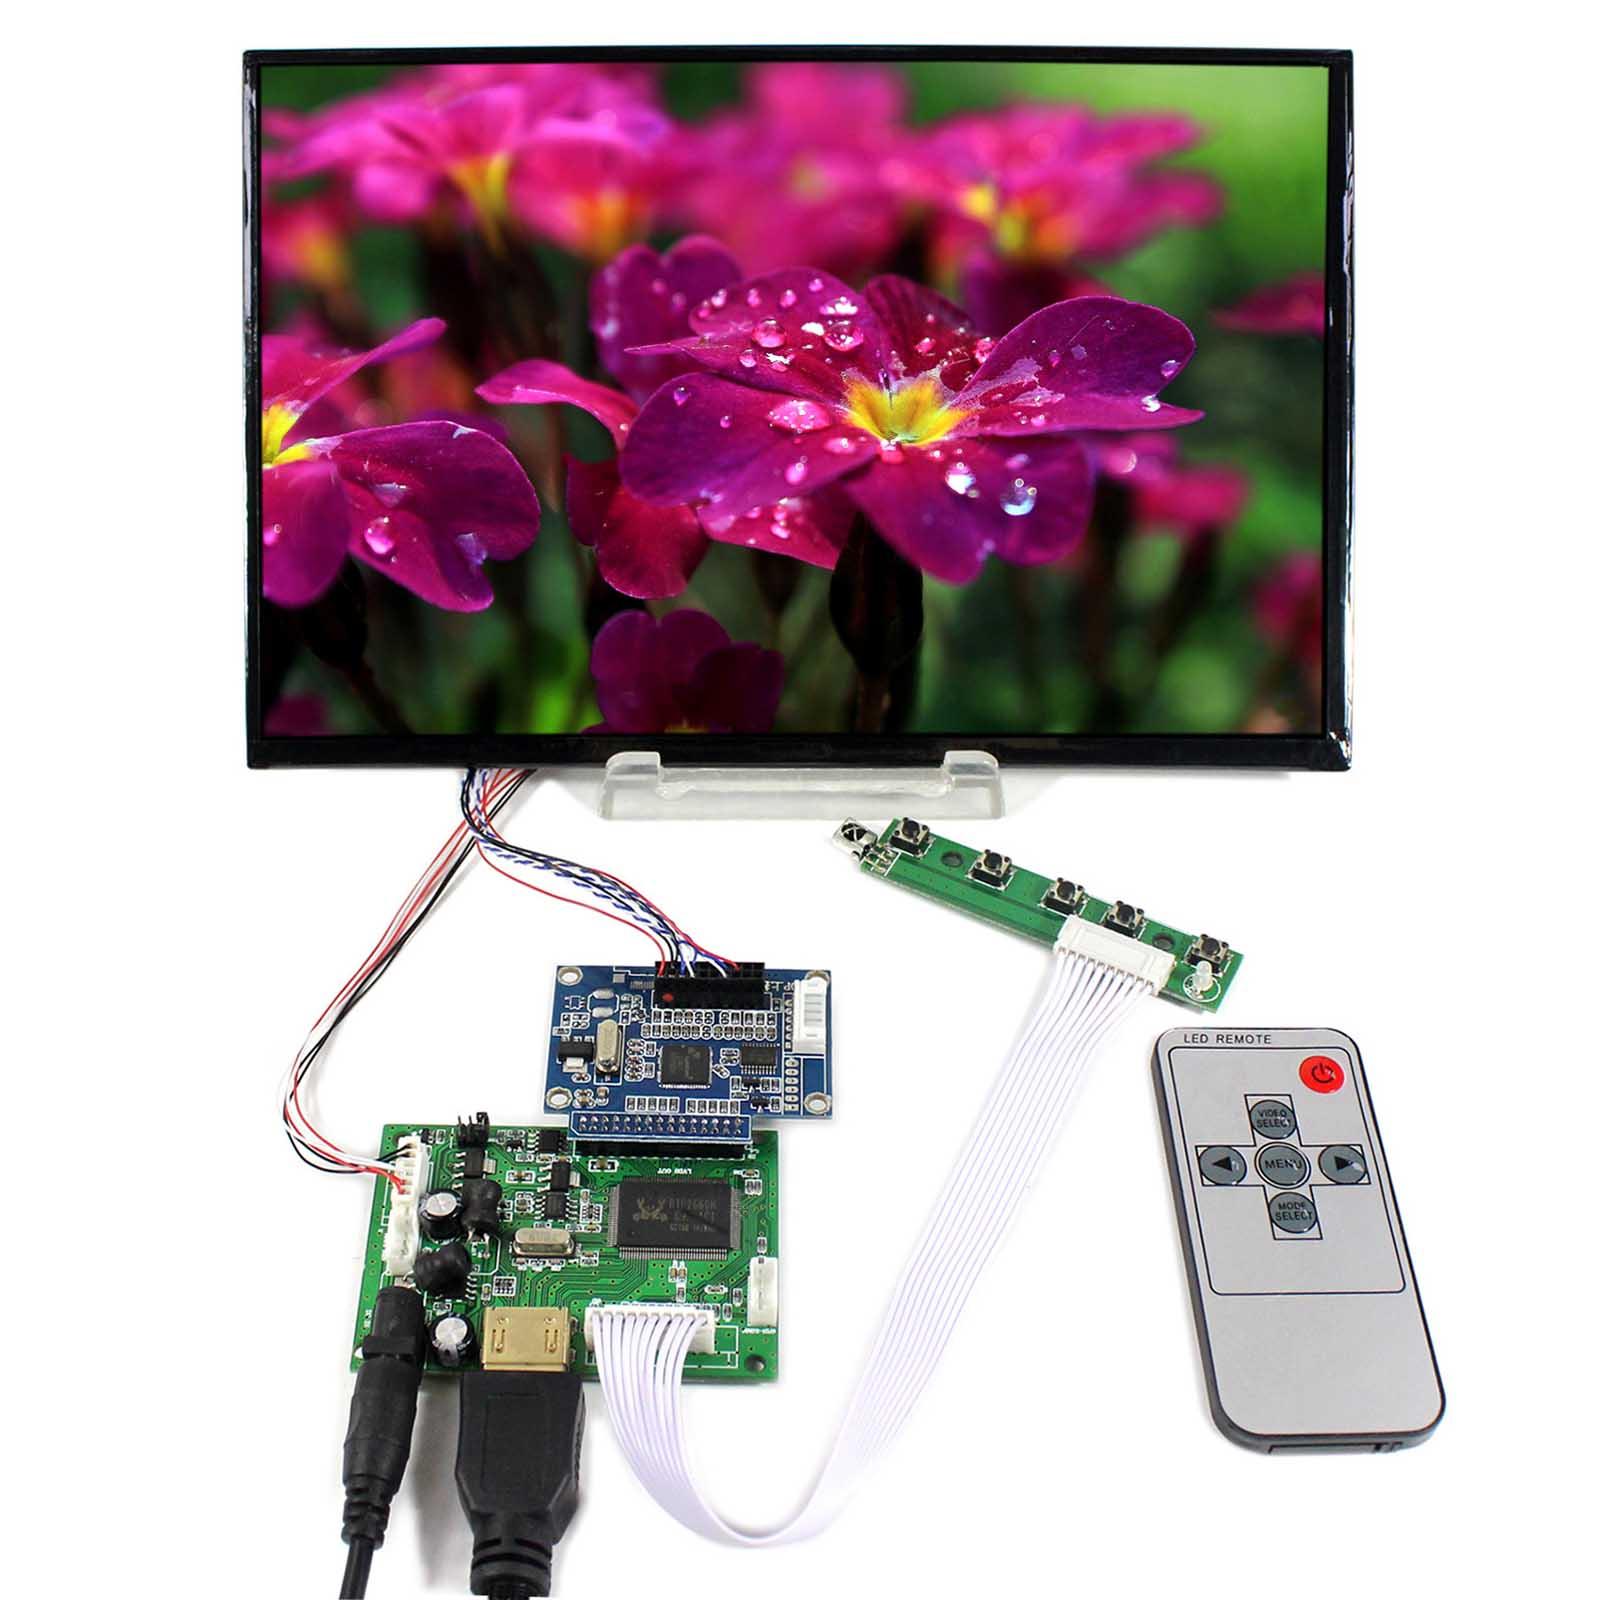 HDMI LCD Controller Board B101UAN01.A VS-TY2660H-V1 Remote Control 10.1inch 1920X1200 LCD ScreenHDMI LCD Controller Board B101UAN01.A VS-TY2660H-V1 Remote Control 10.1inch 1920X1200 LCD Screen